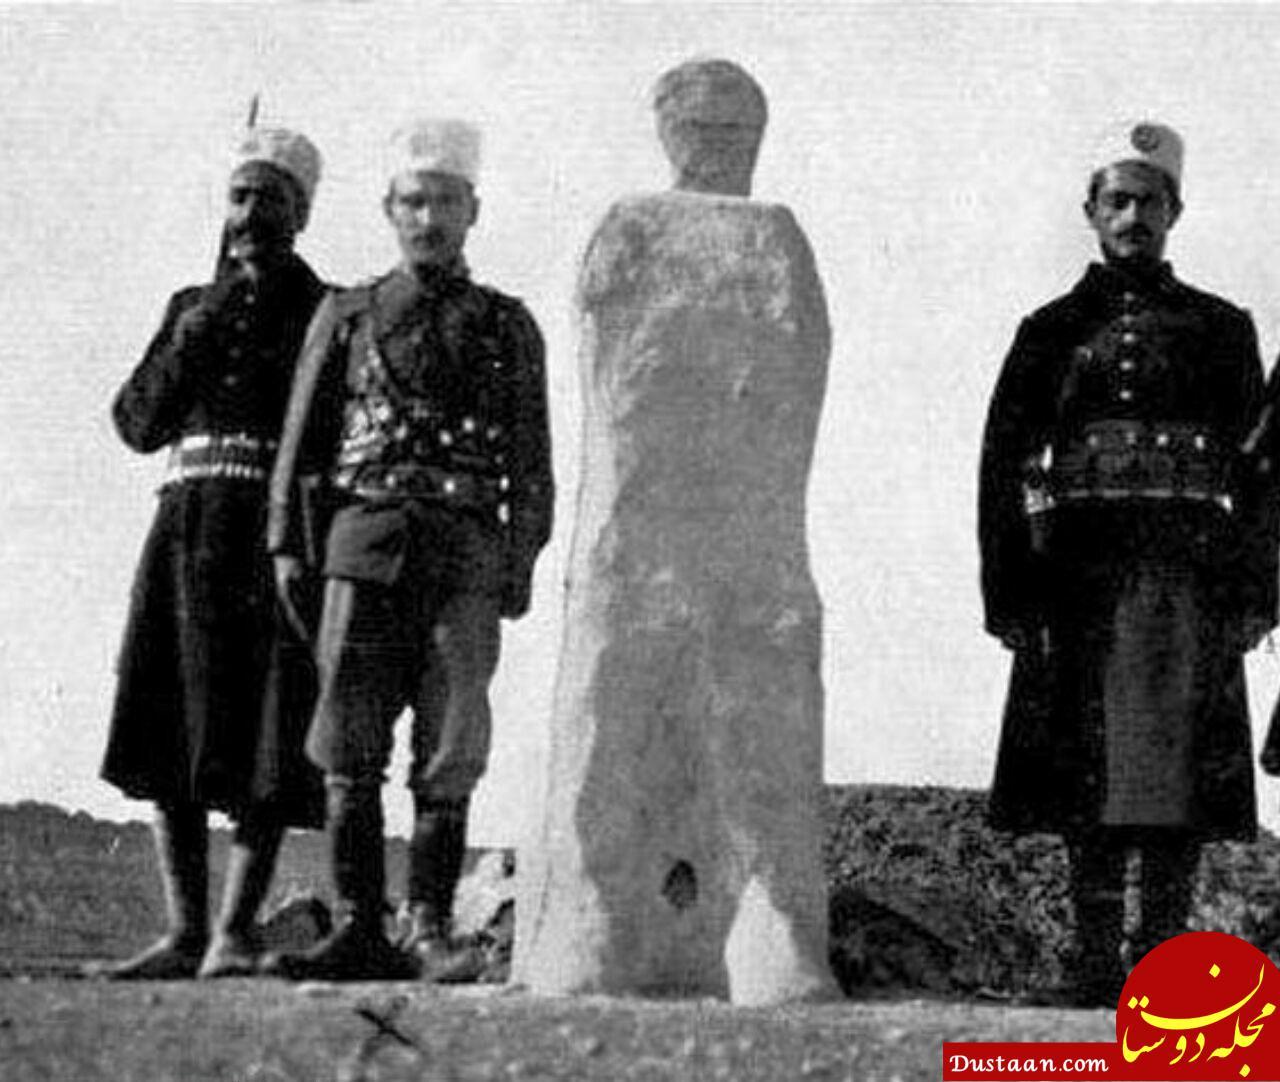 www.dustaan.com مجازات عجیب یک مجرم در عهد قاجار! +عکس